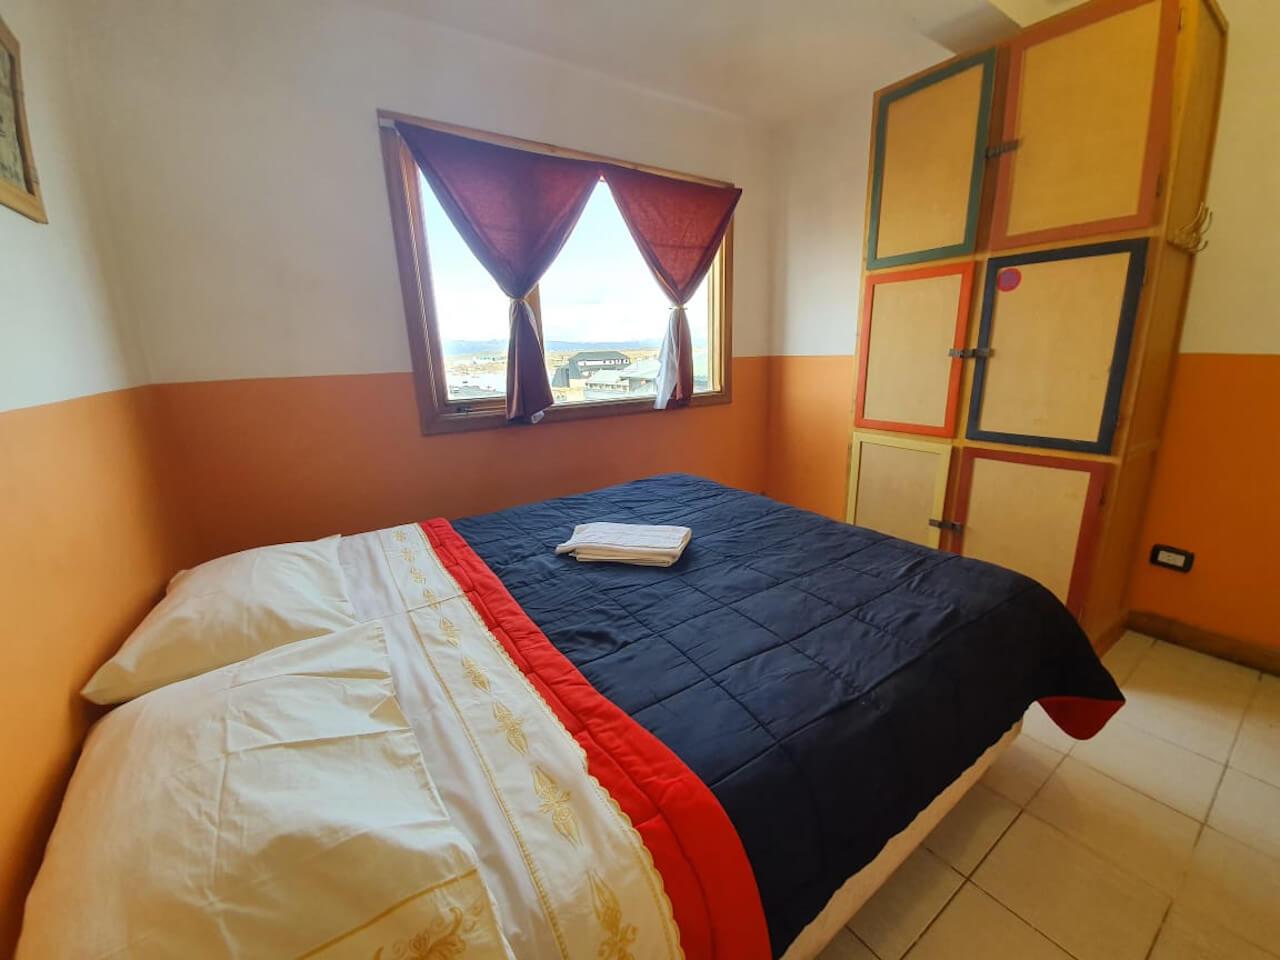 Yaghan Hostel cuarto 1 persona